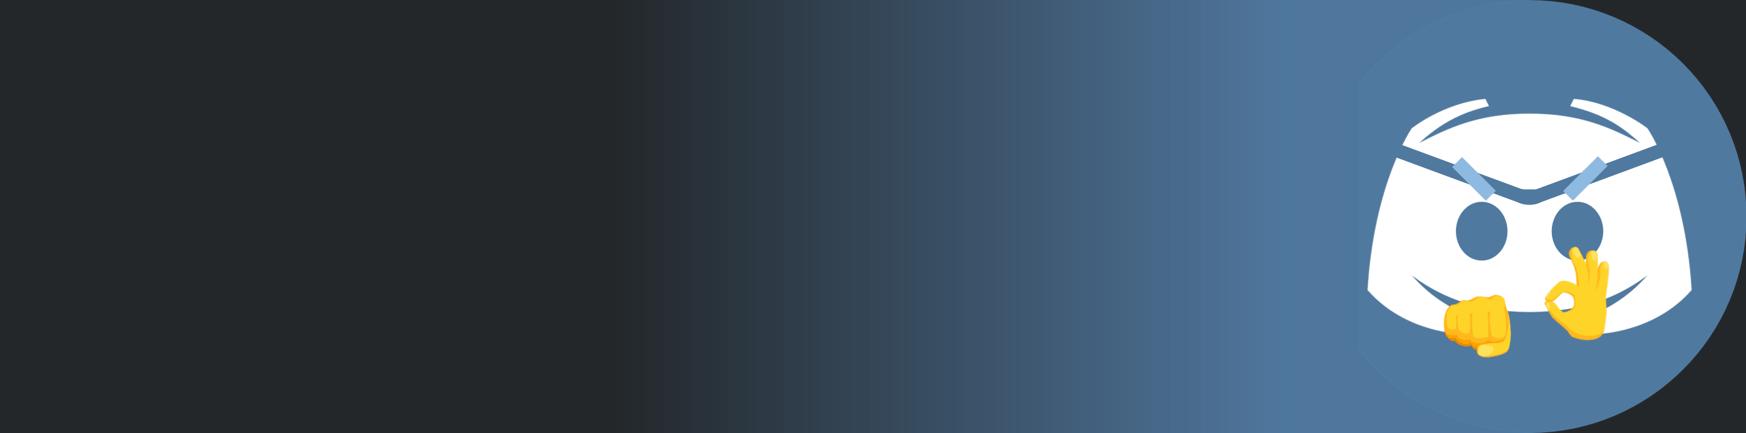 ServerMate Banner